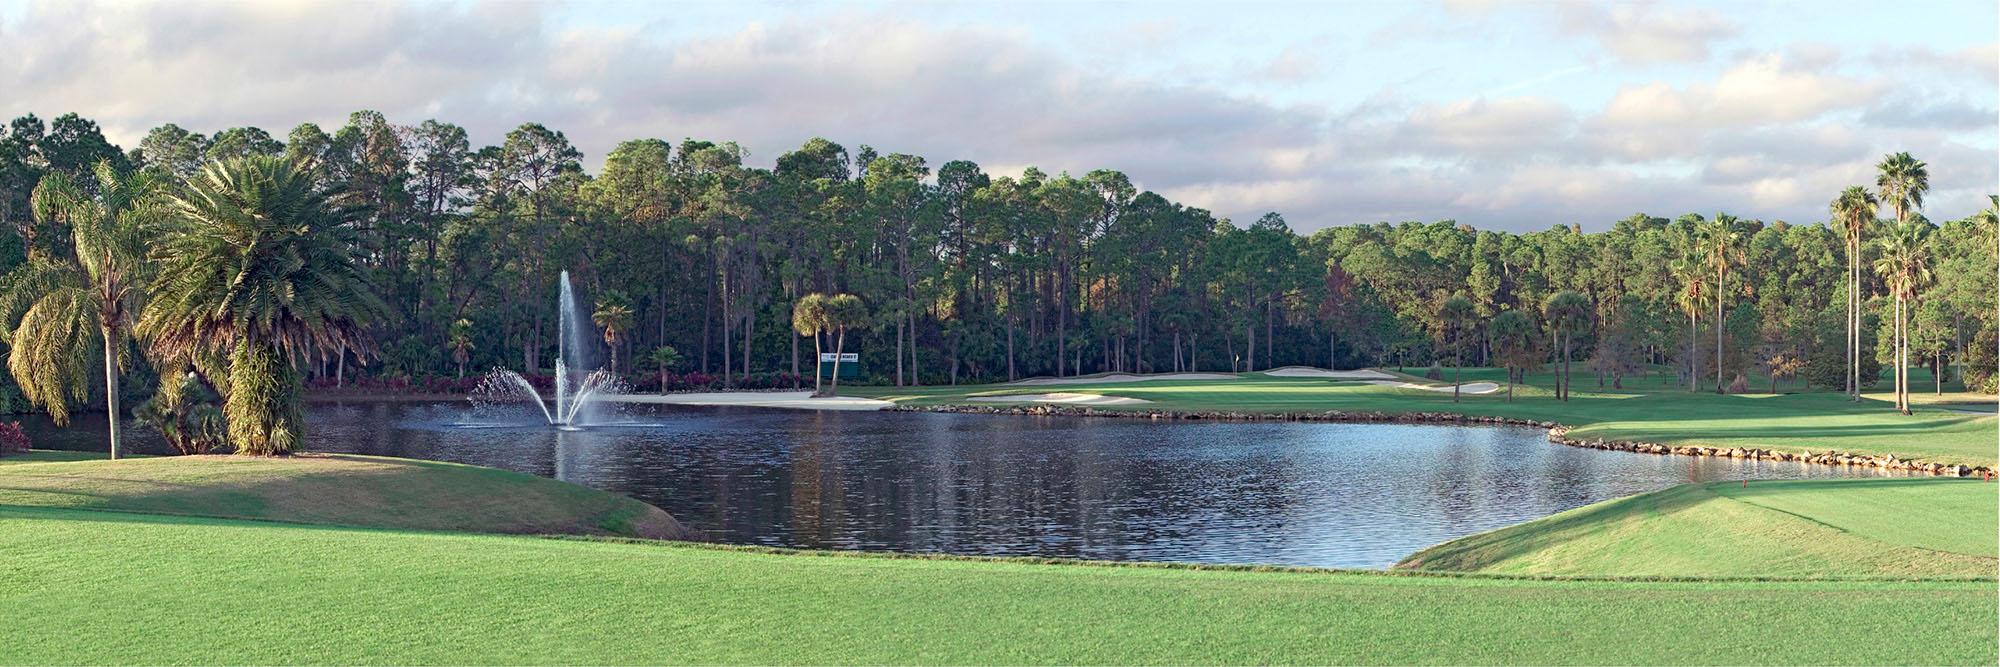 Golf Course Image - Disney's Palm Course No. 16